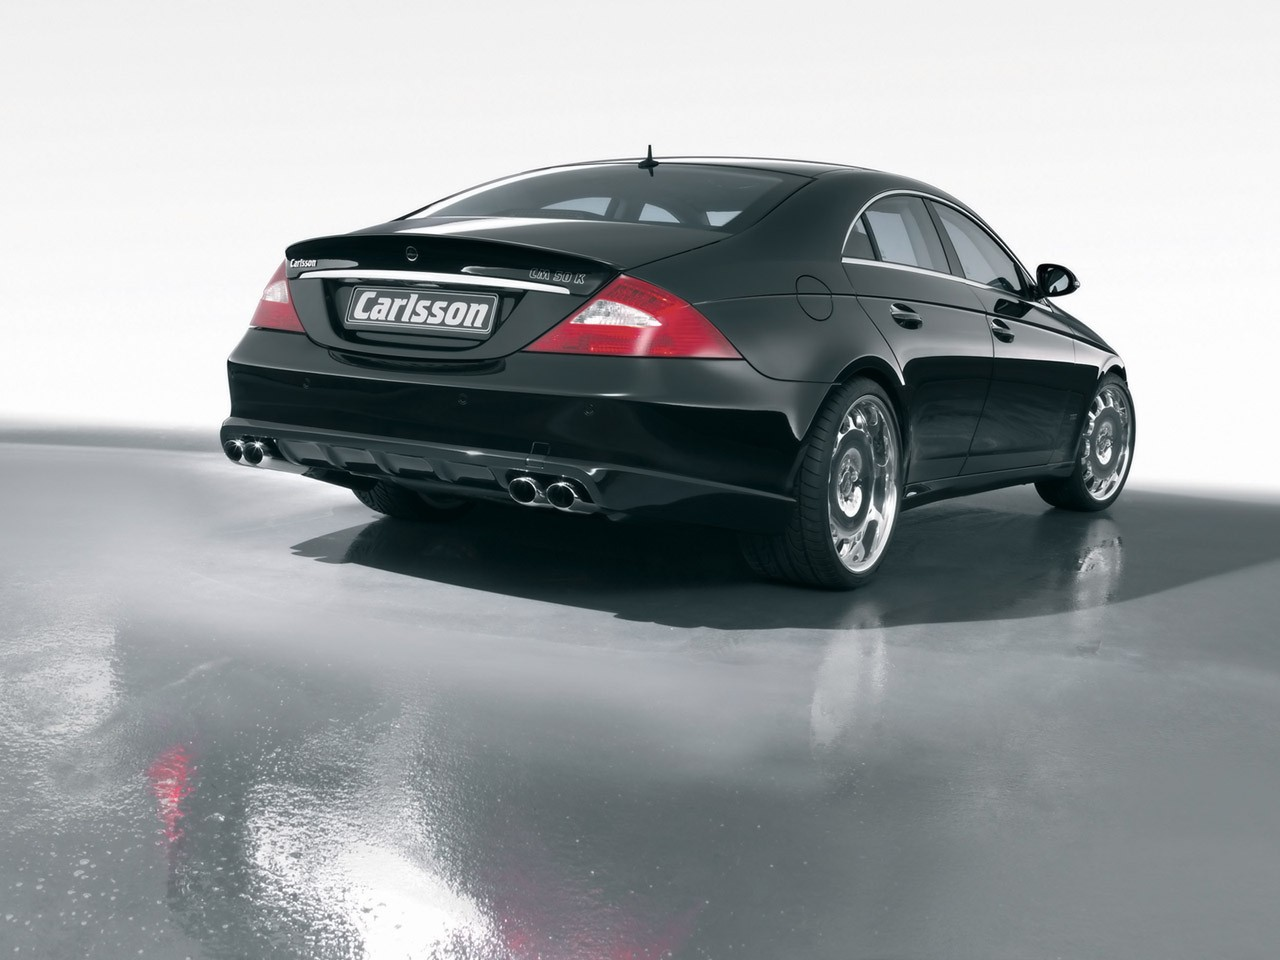 2005 Carlsson CK55 Mercedes